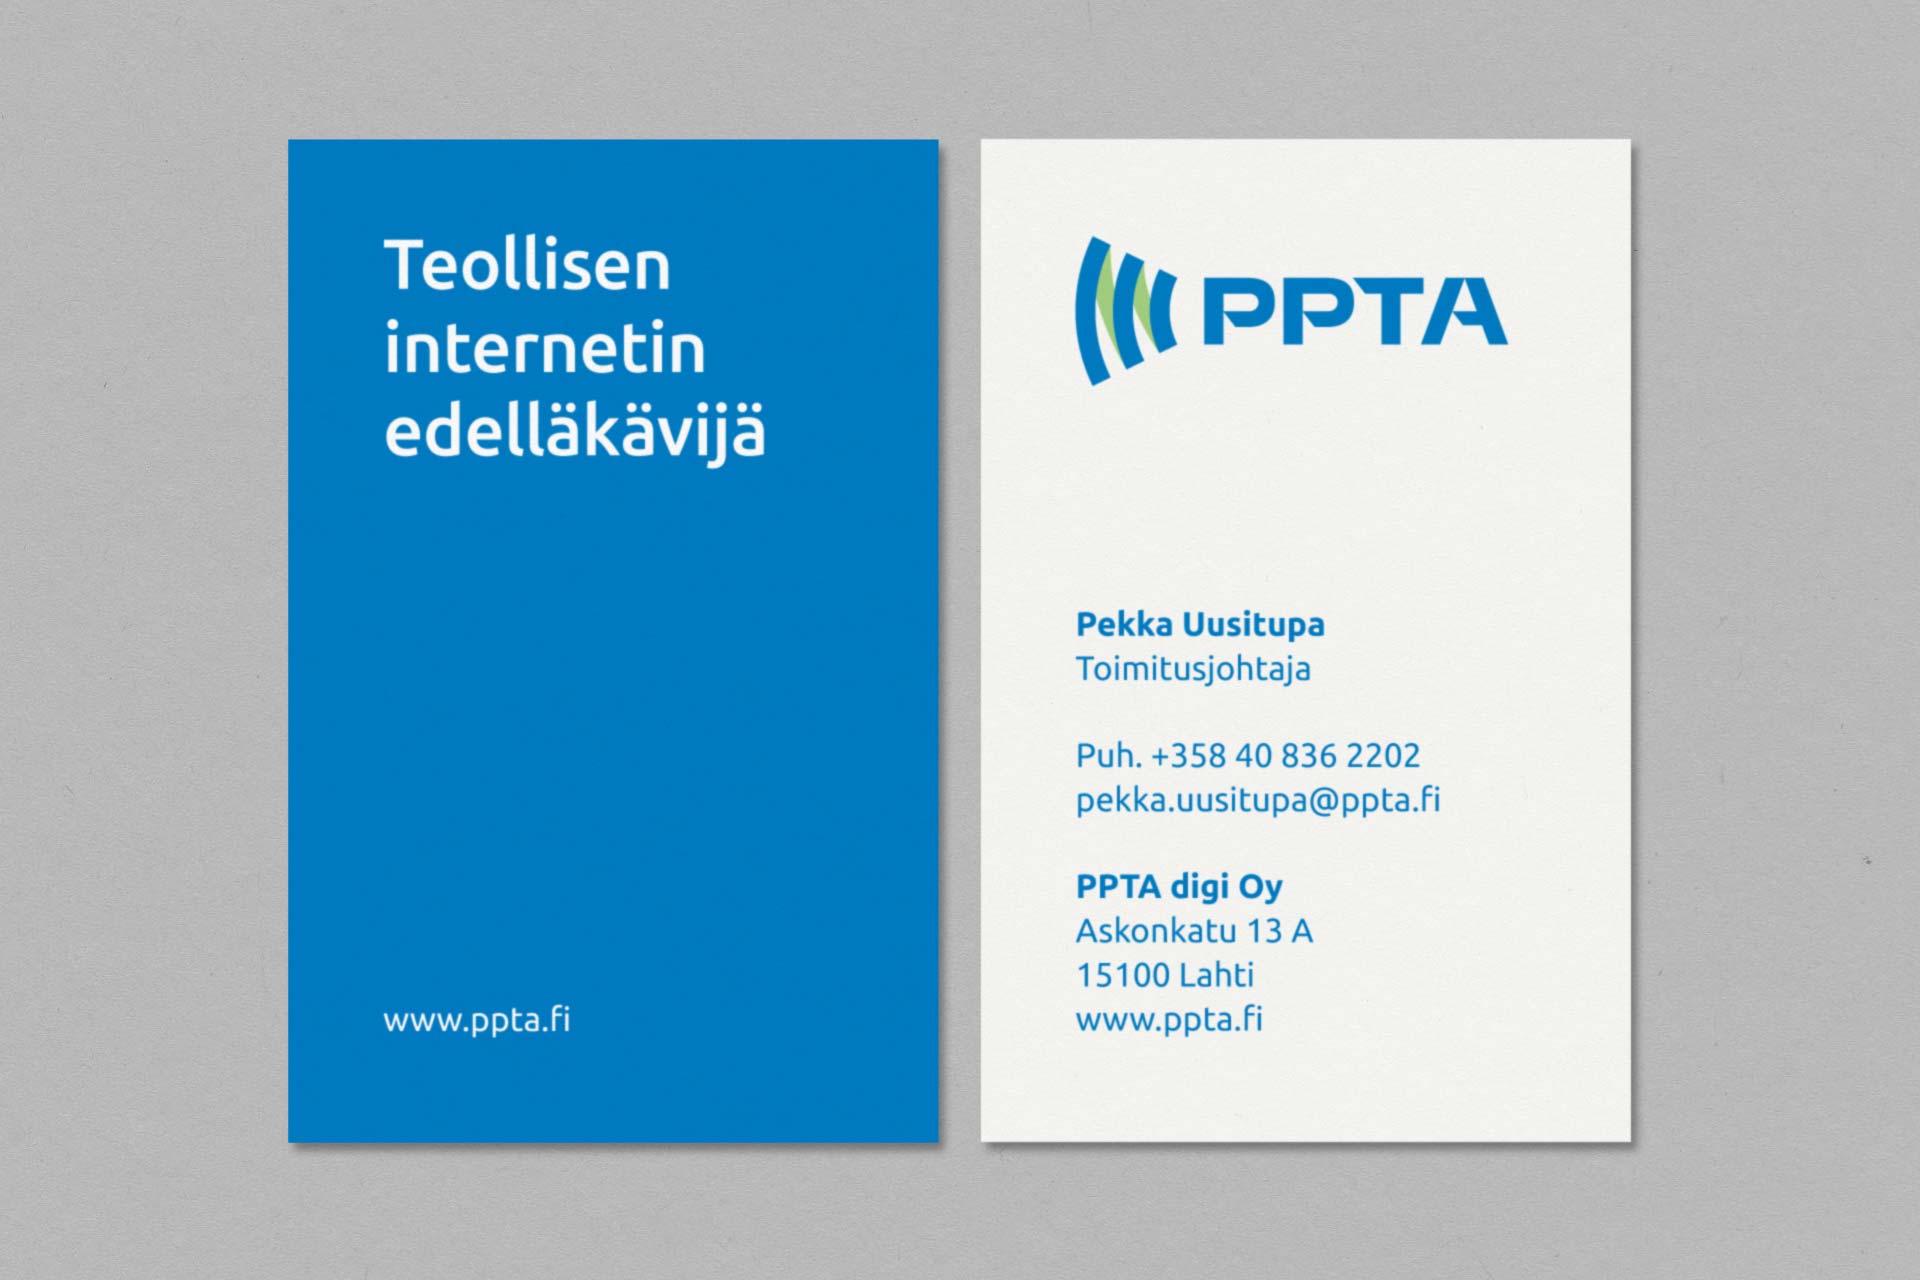 ppta_kk